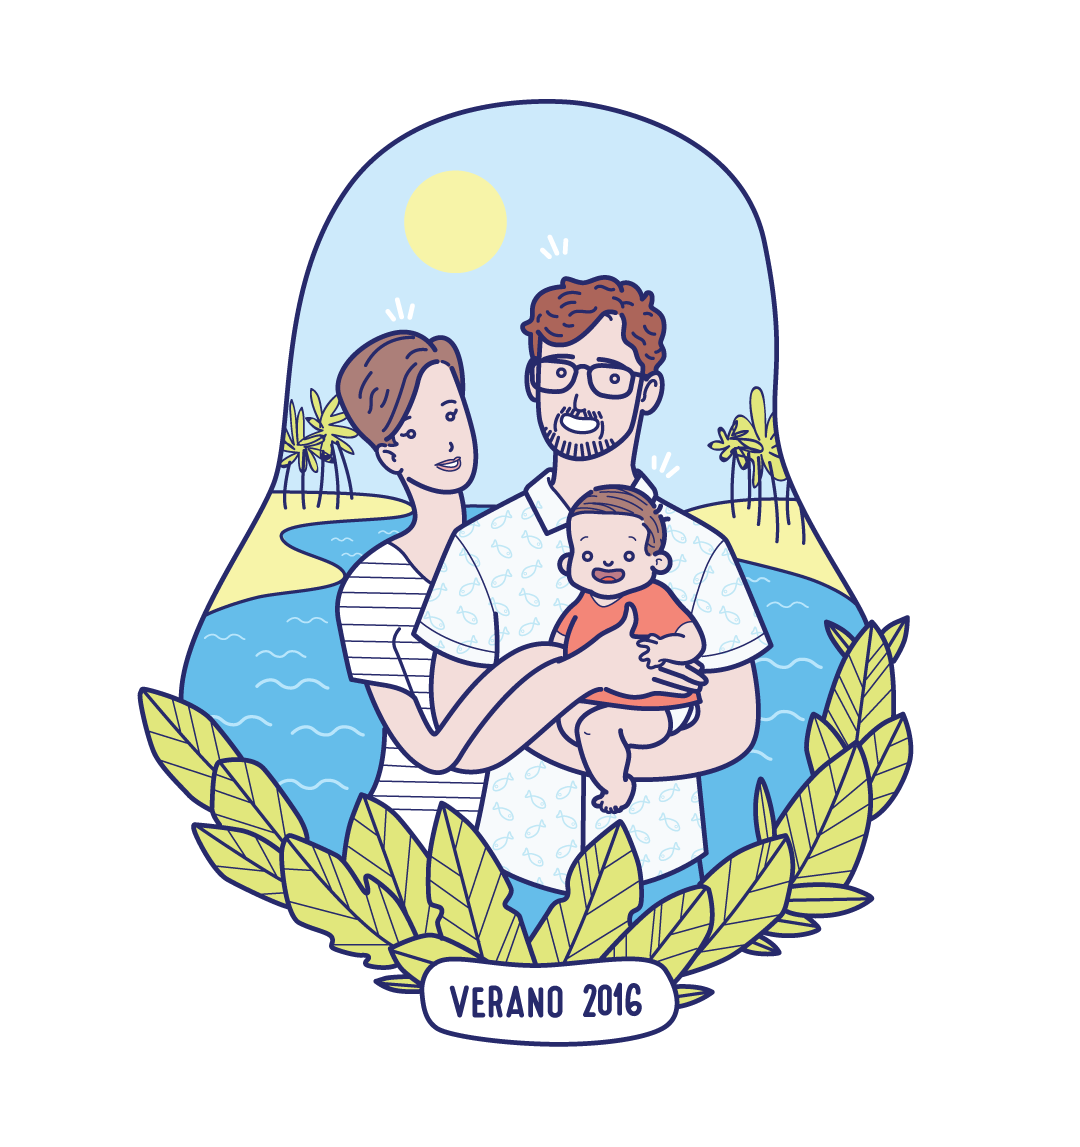 Sofia and Family  #avatar #customized #customized illustration #illustration #cartoon #avatar cartoon #johann andreu